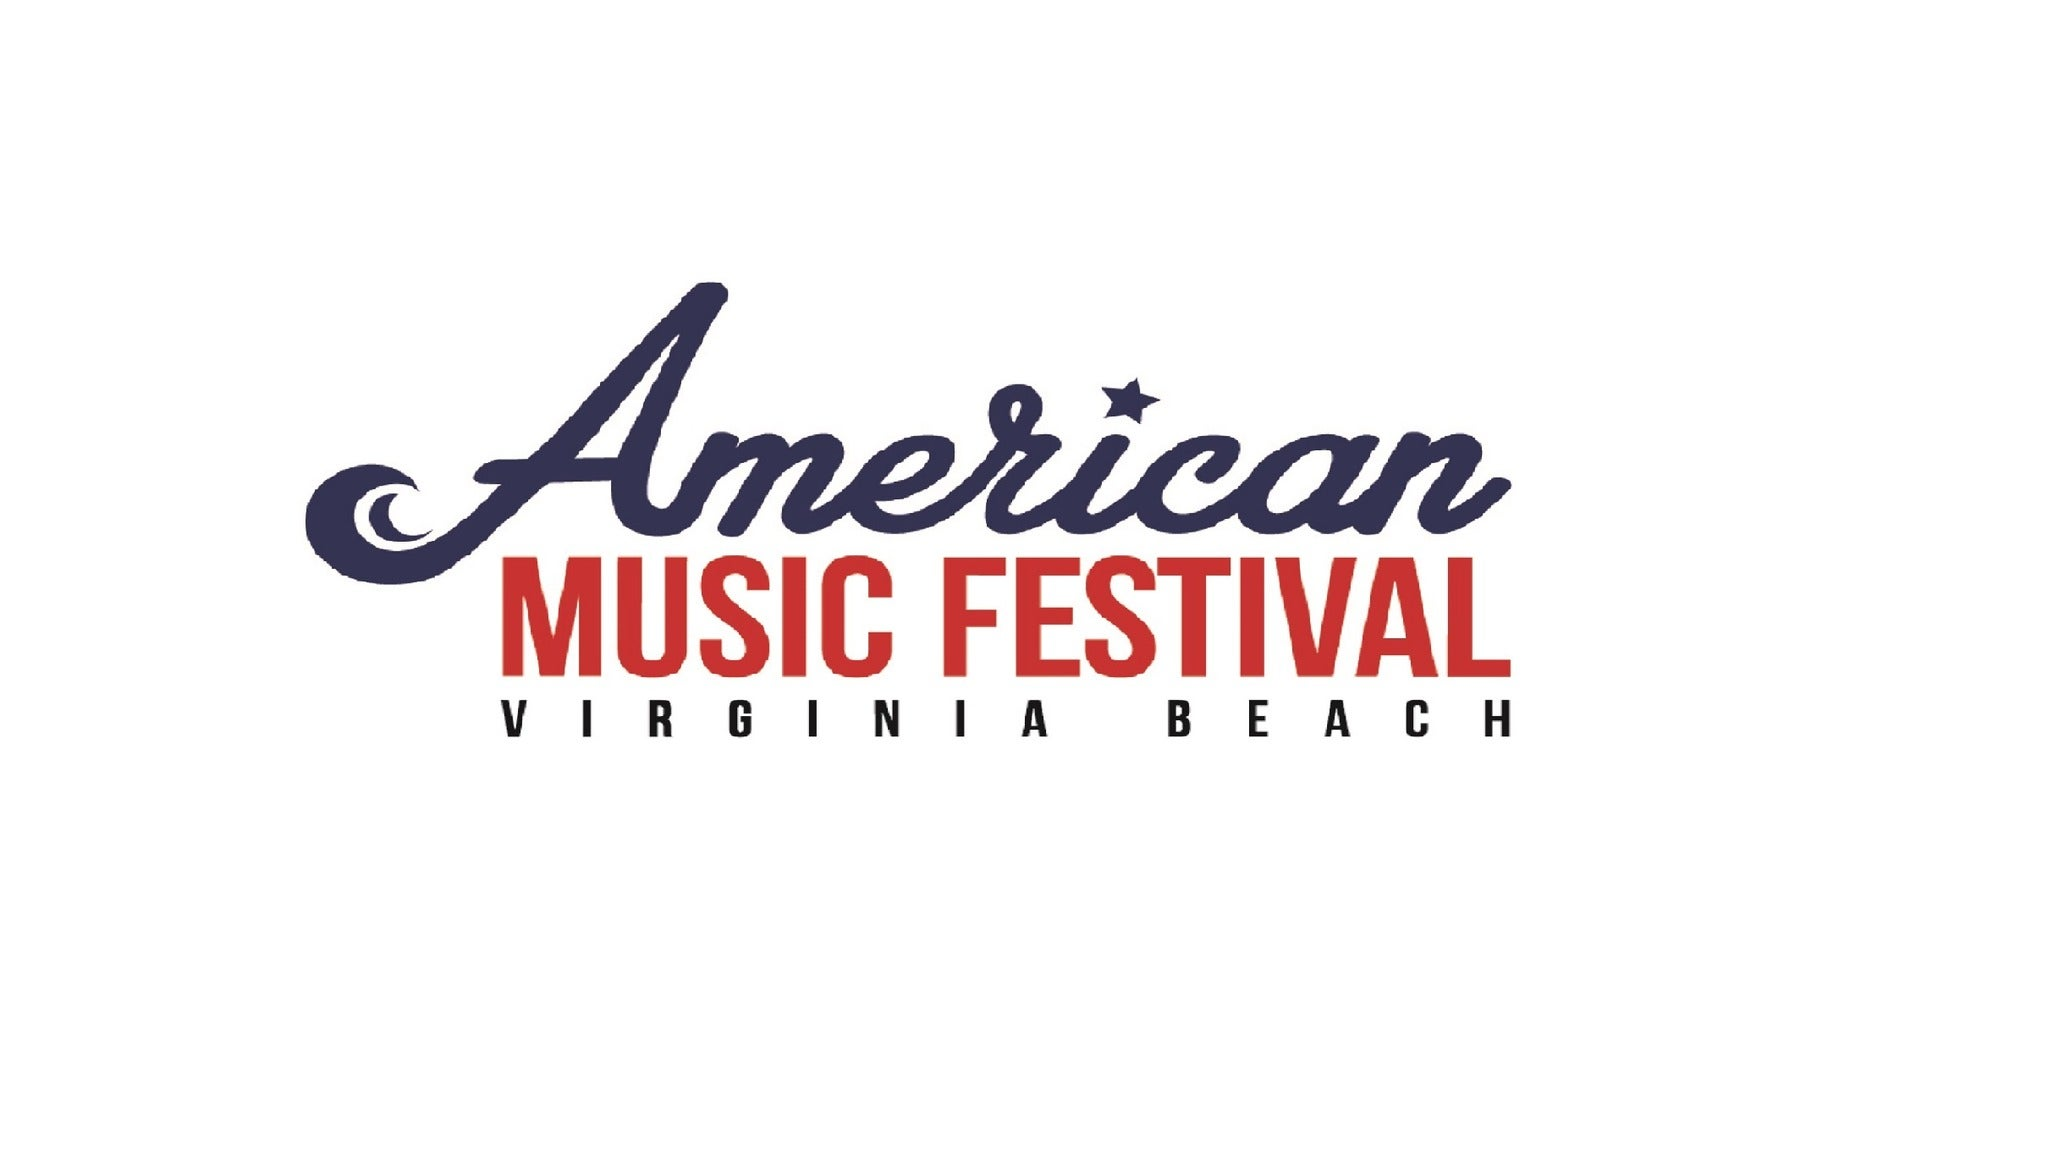 American Music Festival - 3 Day Passport Pin